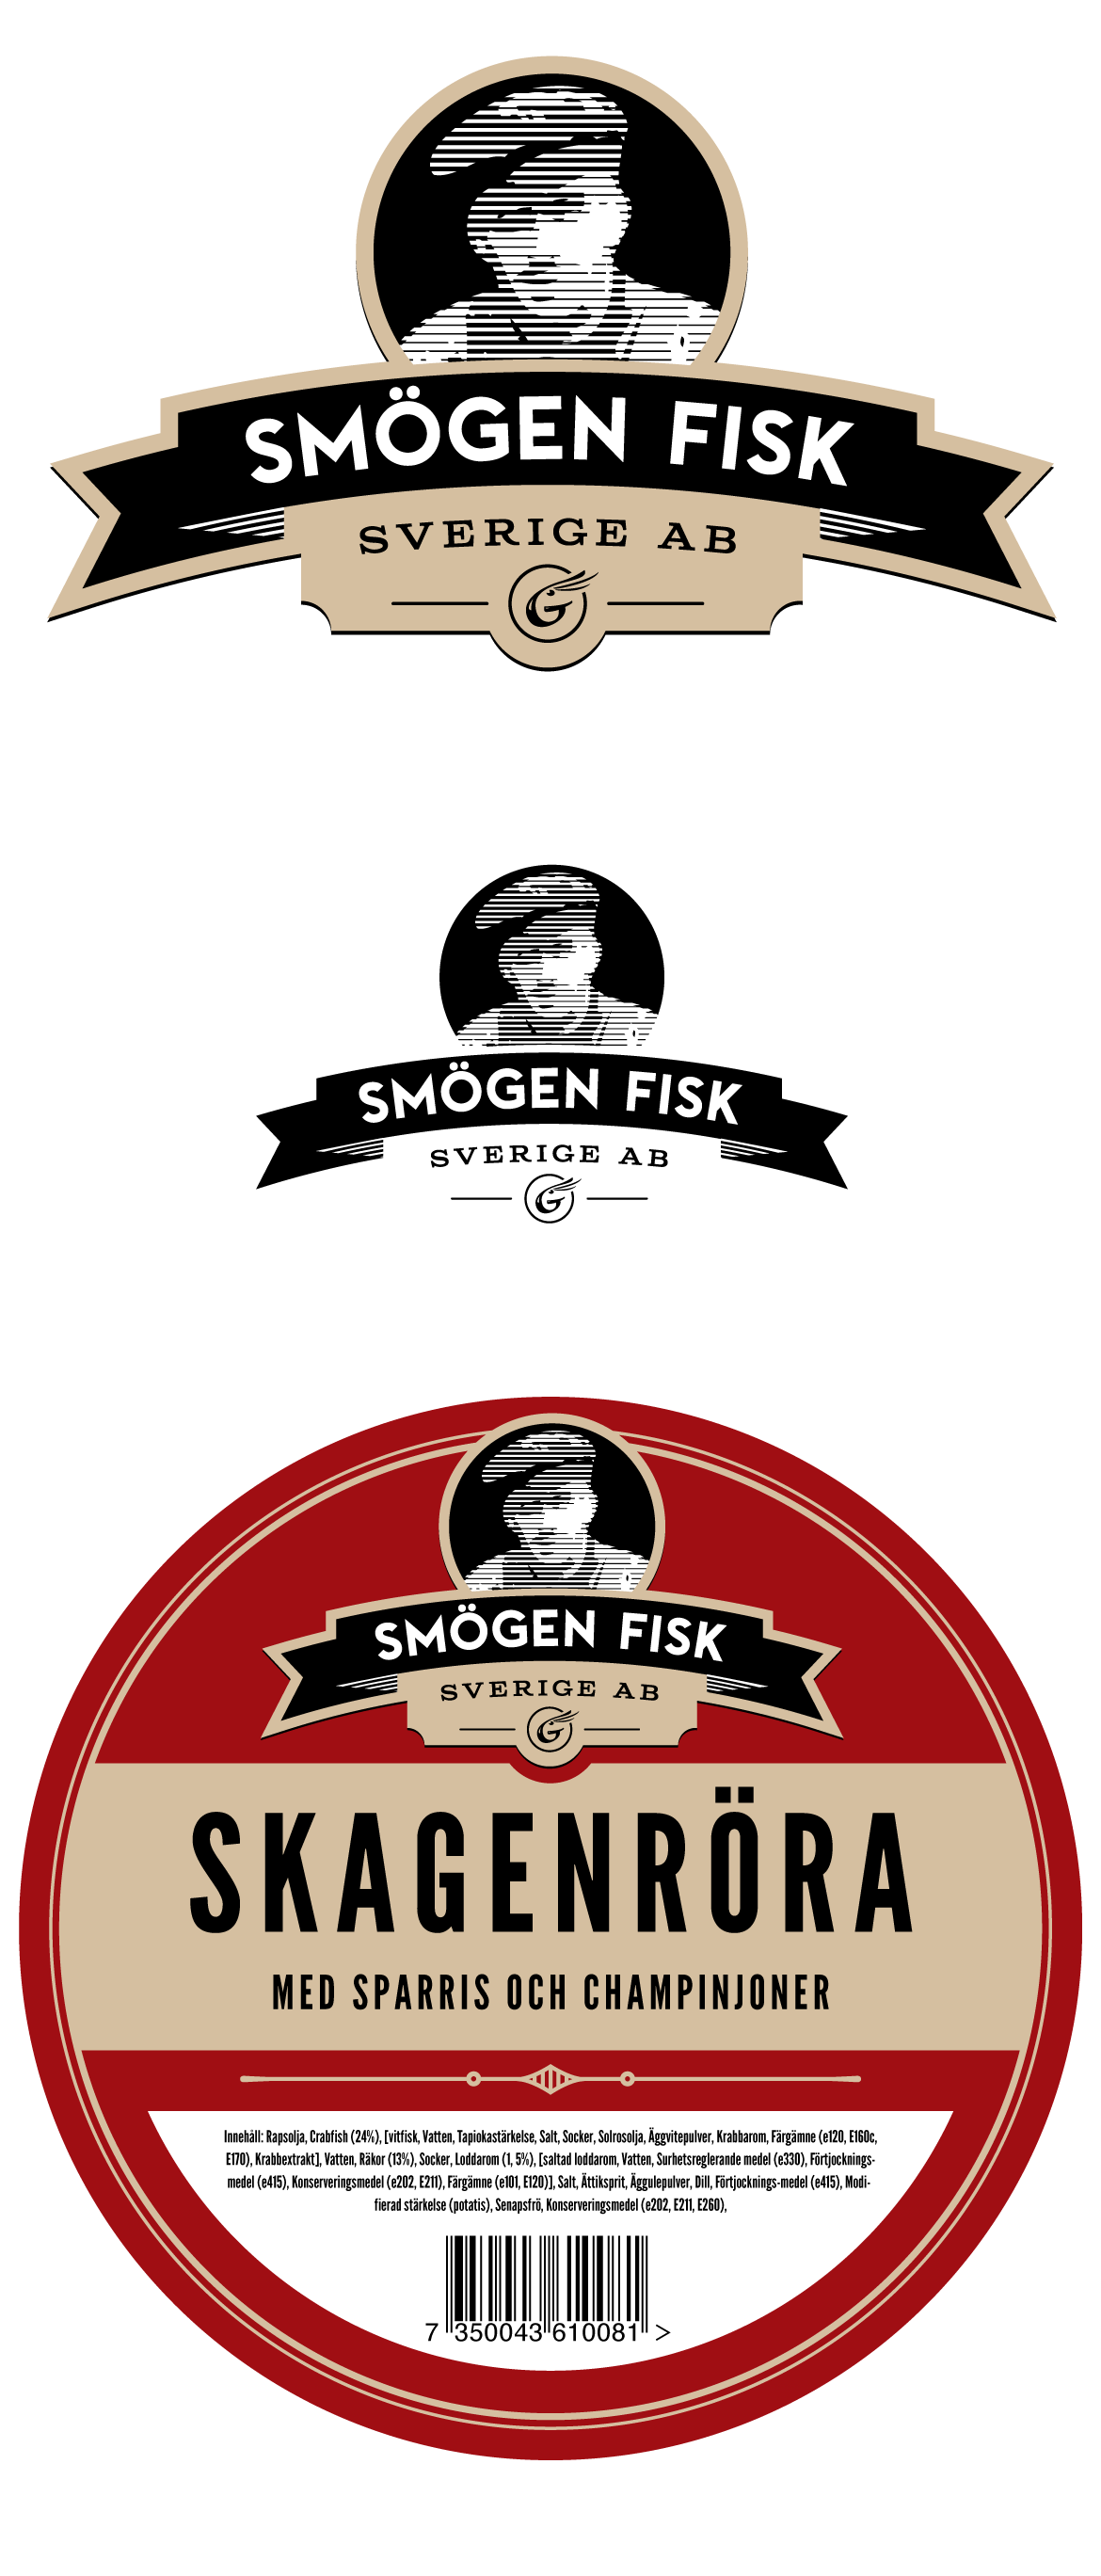 Smogenfisk_loggor-01